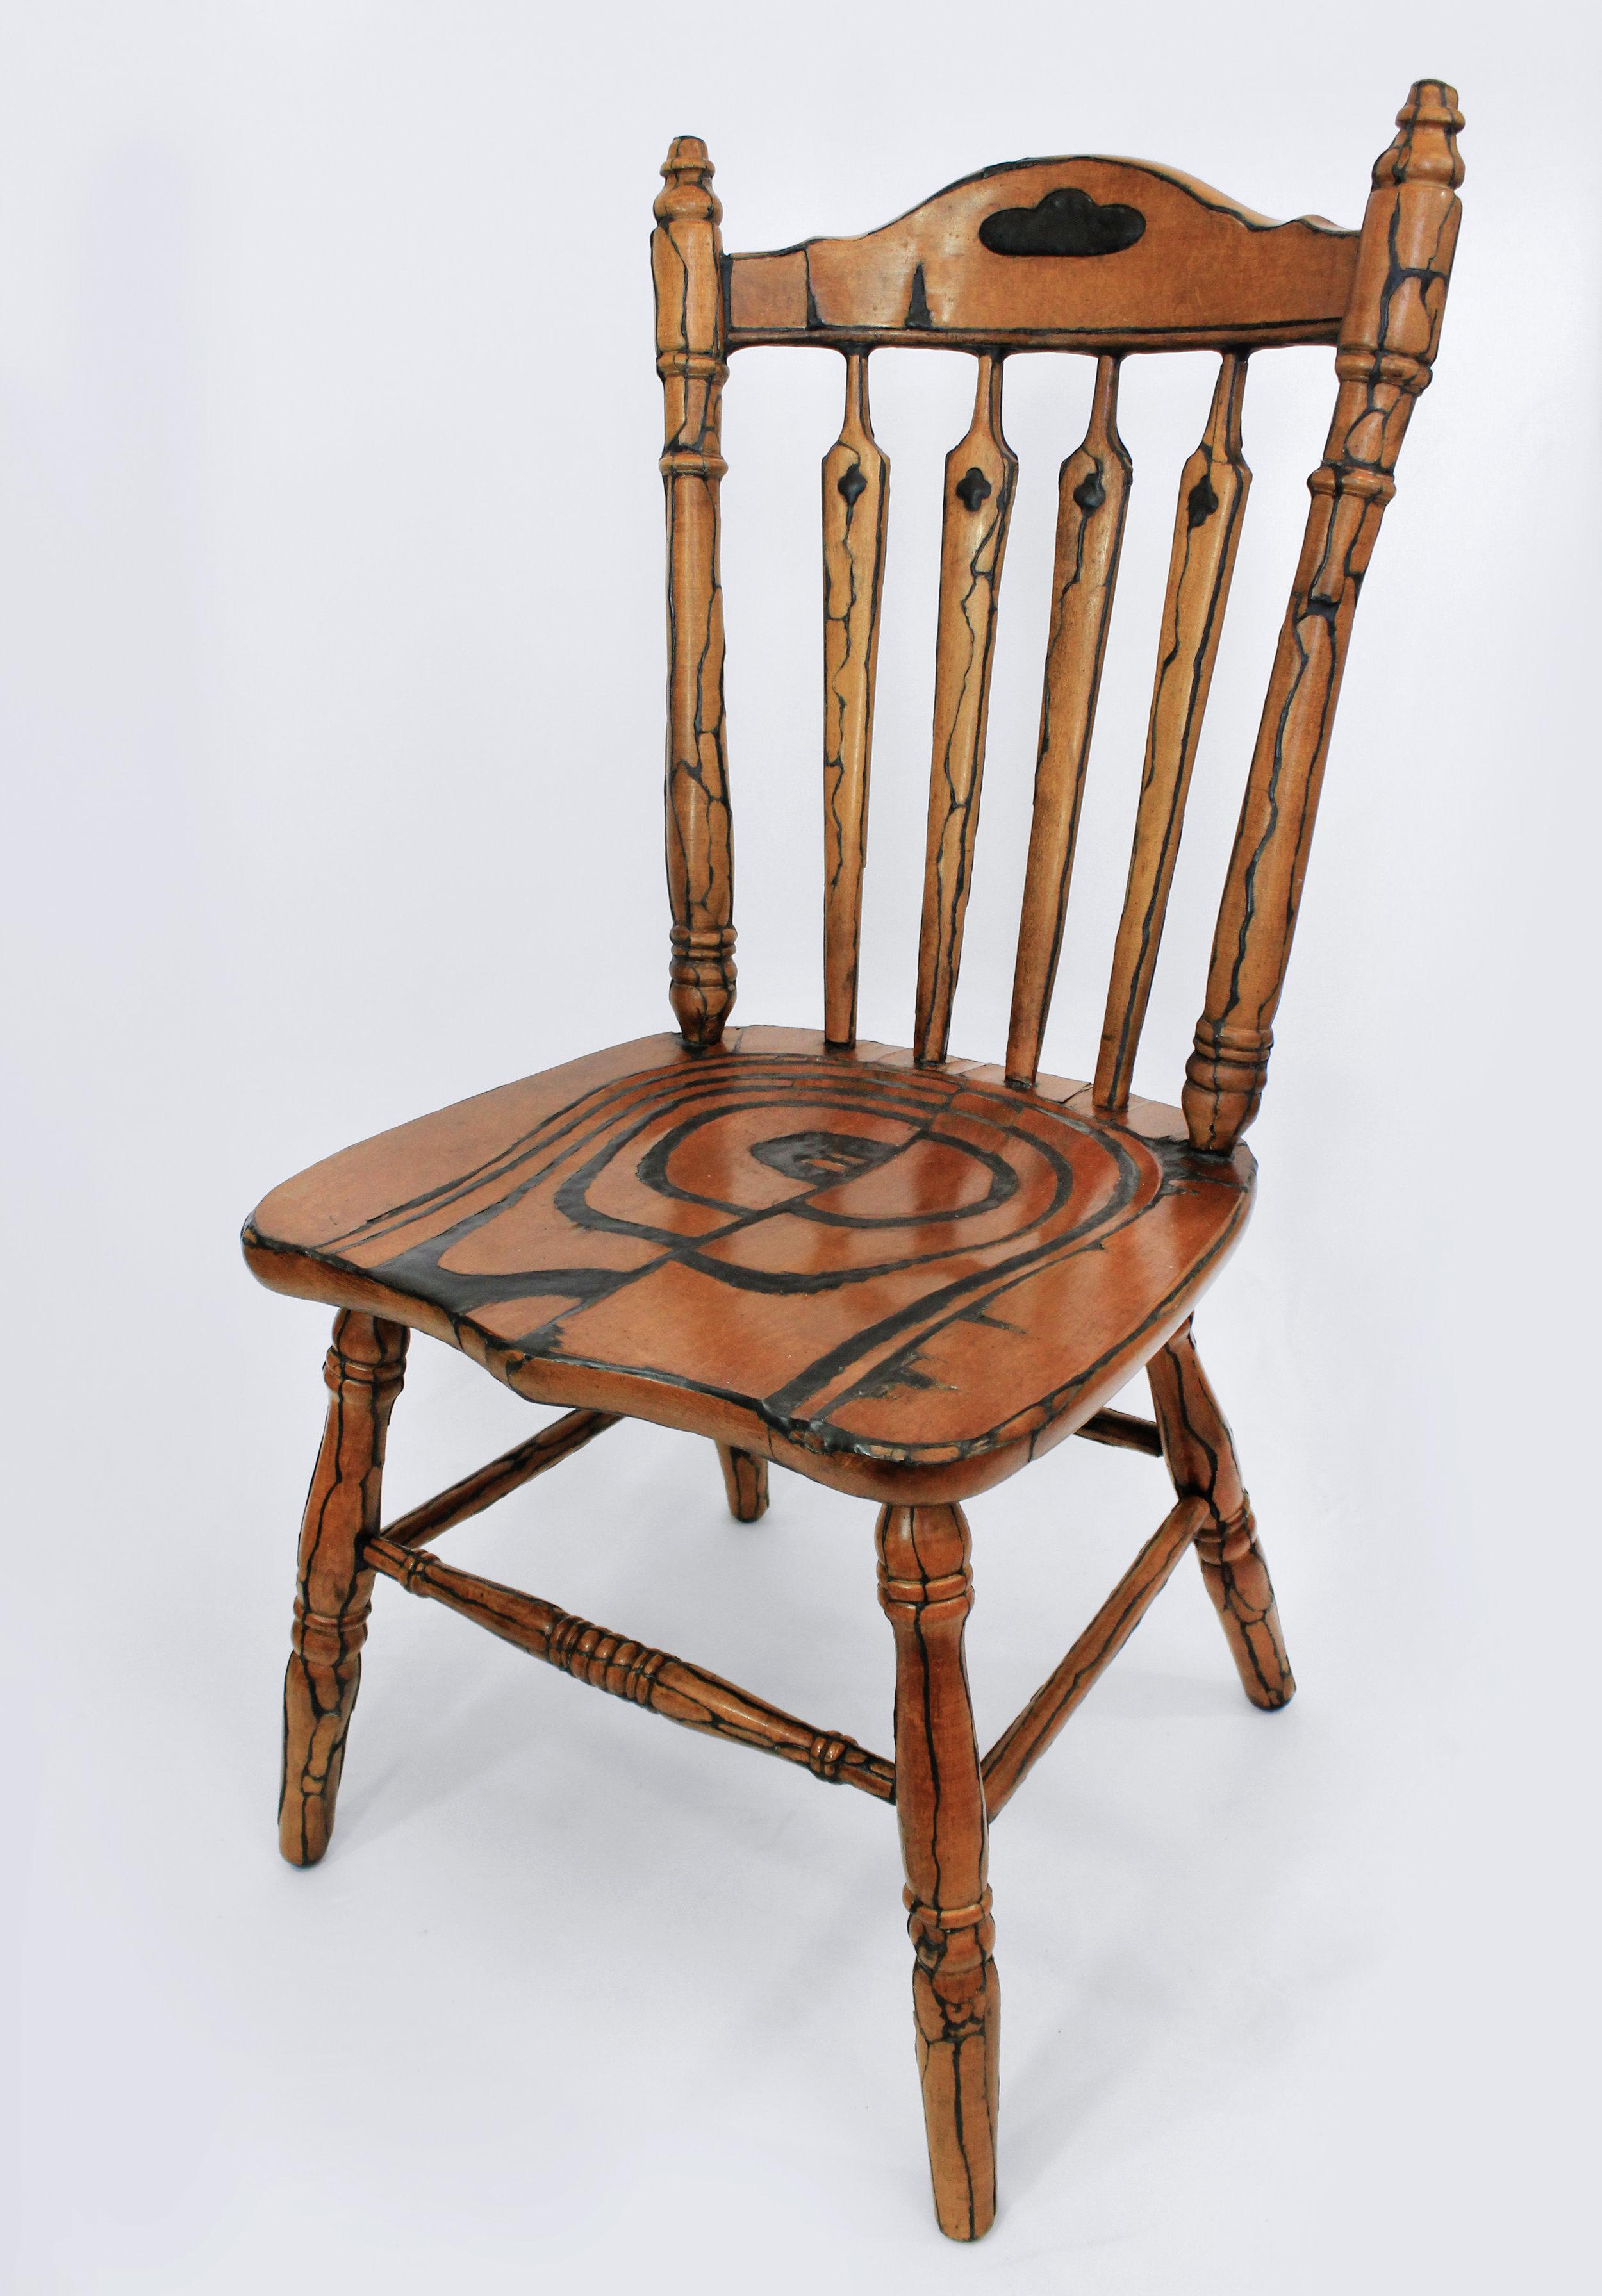 Skinned Chair (Skin)  Found furniture, epoxy clay, steel (armature) 18.5 x 18.5 x 38 in. 2019